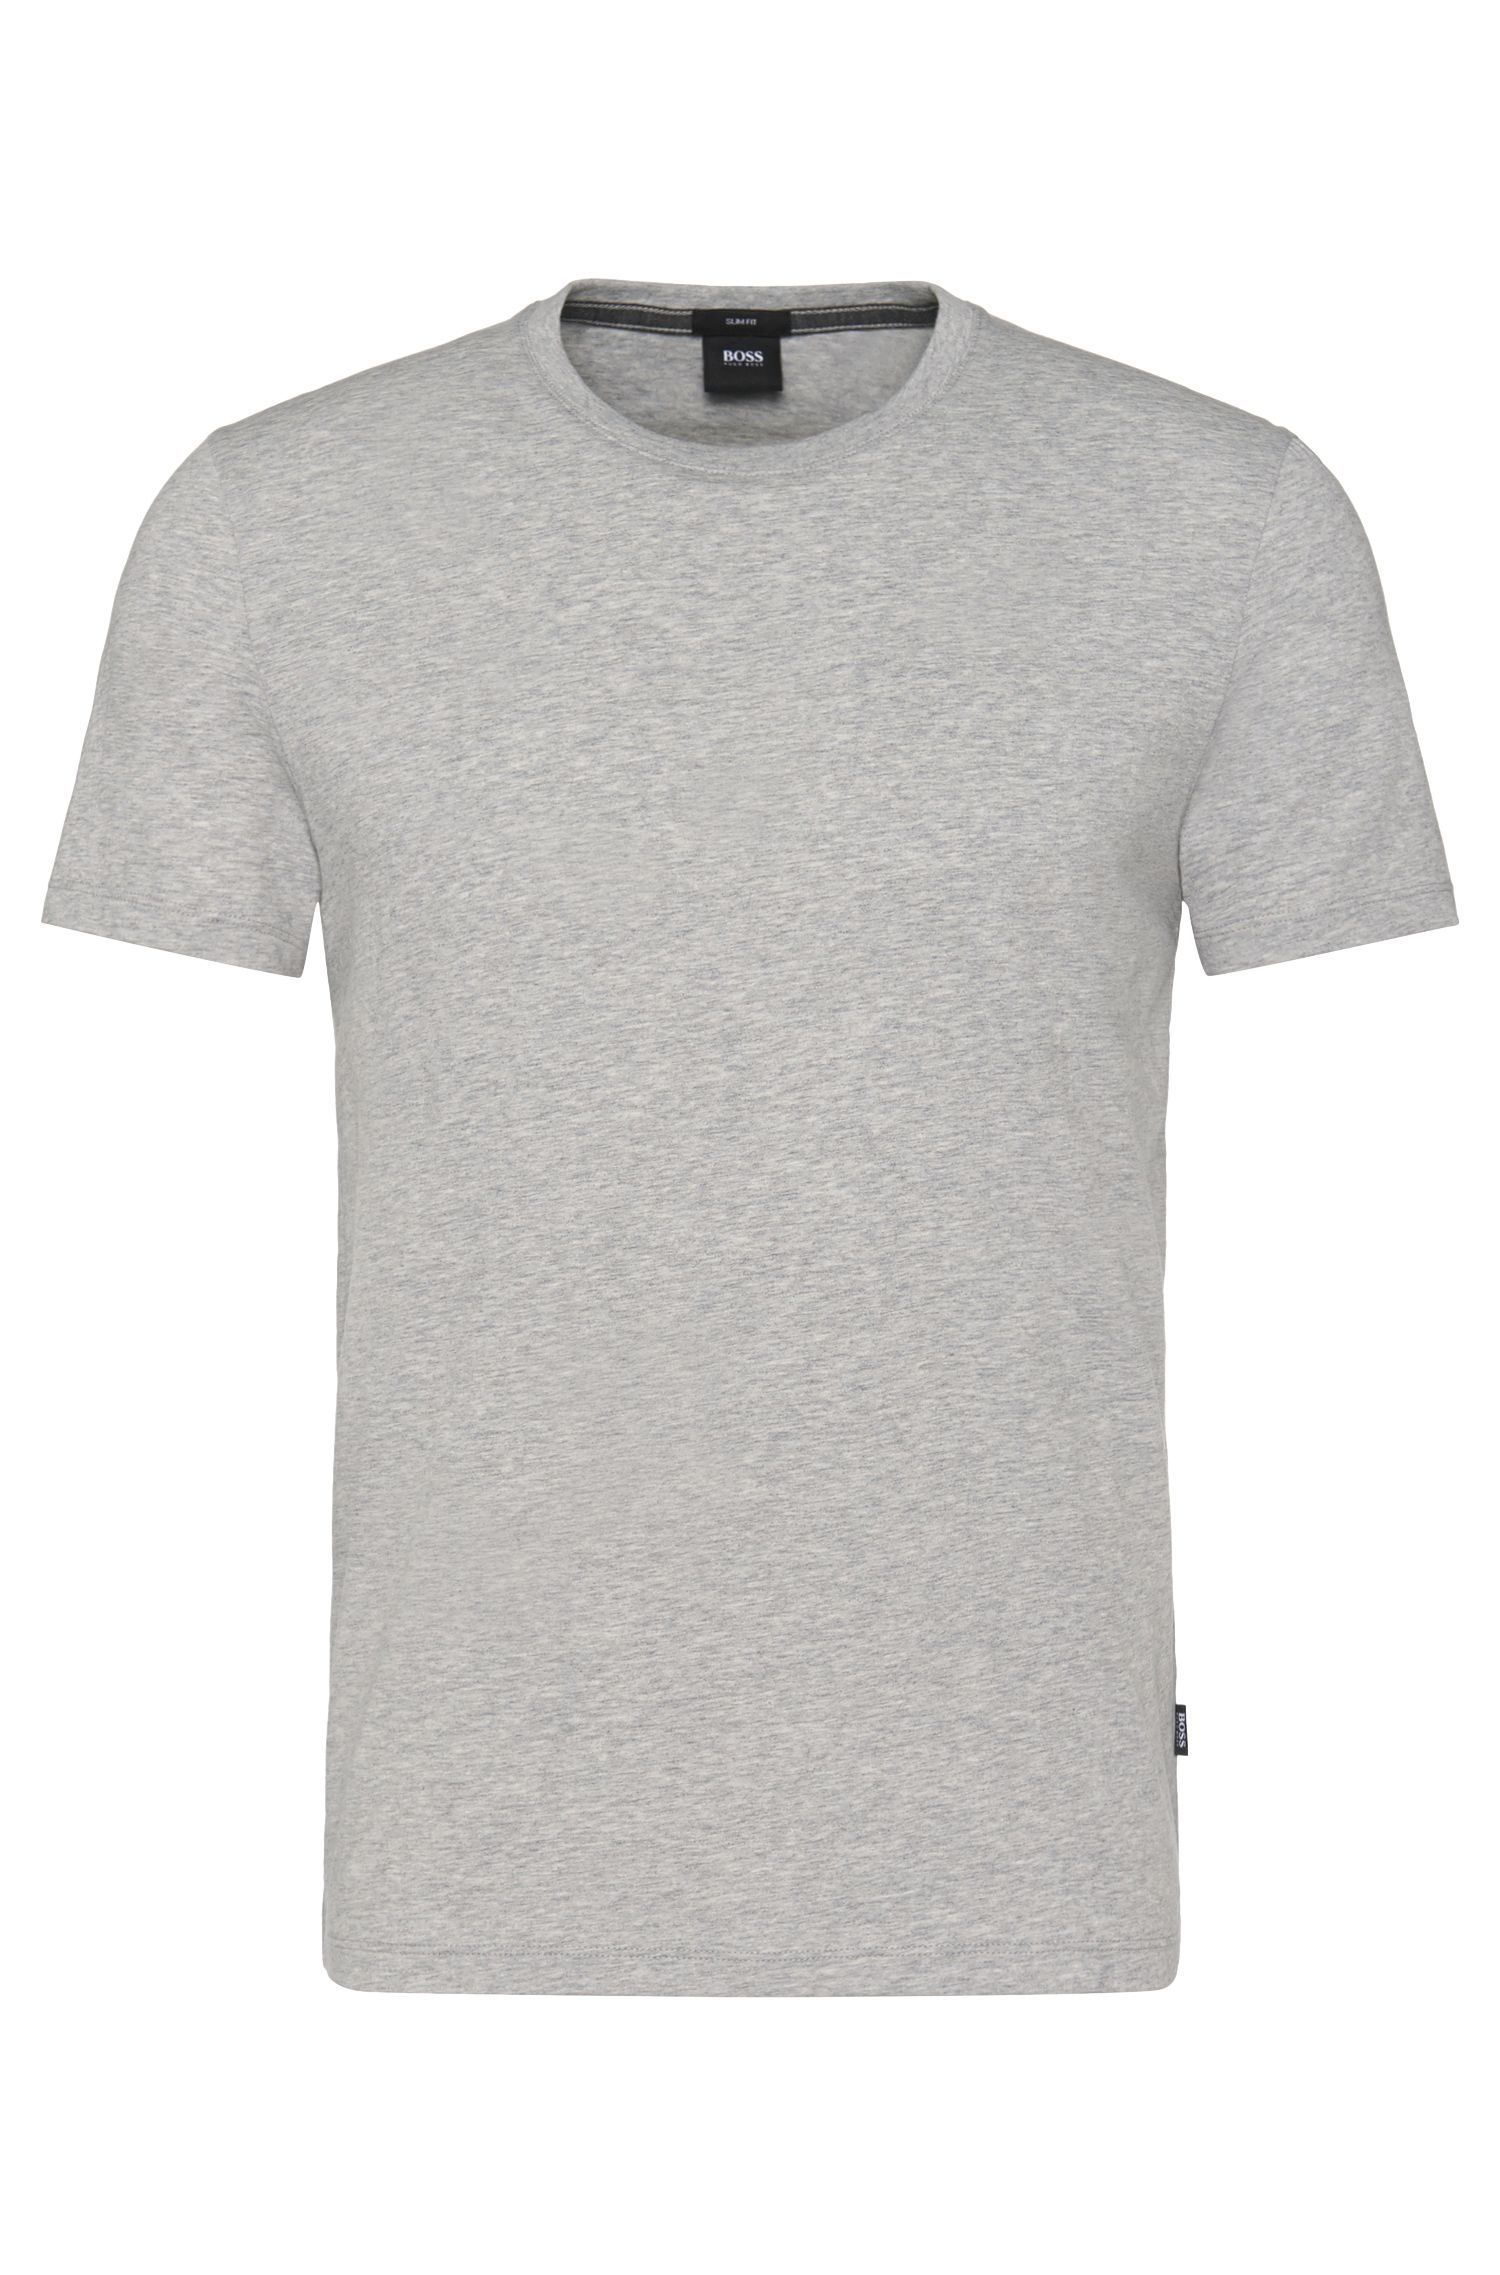 'Tessler' | Cotton Crew T-Shirt